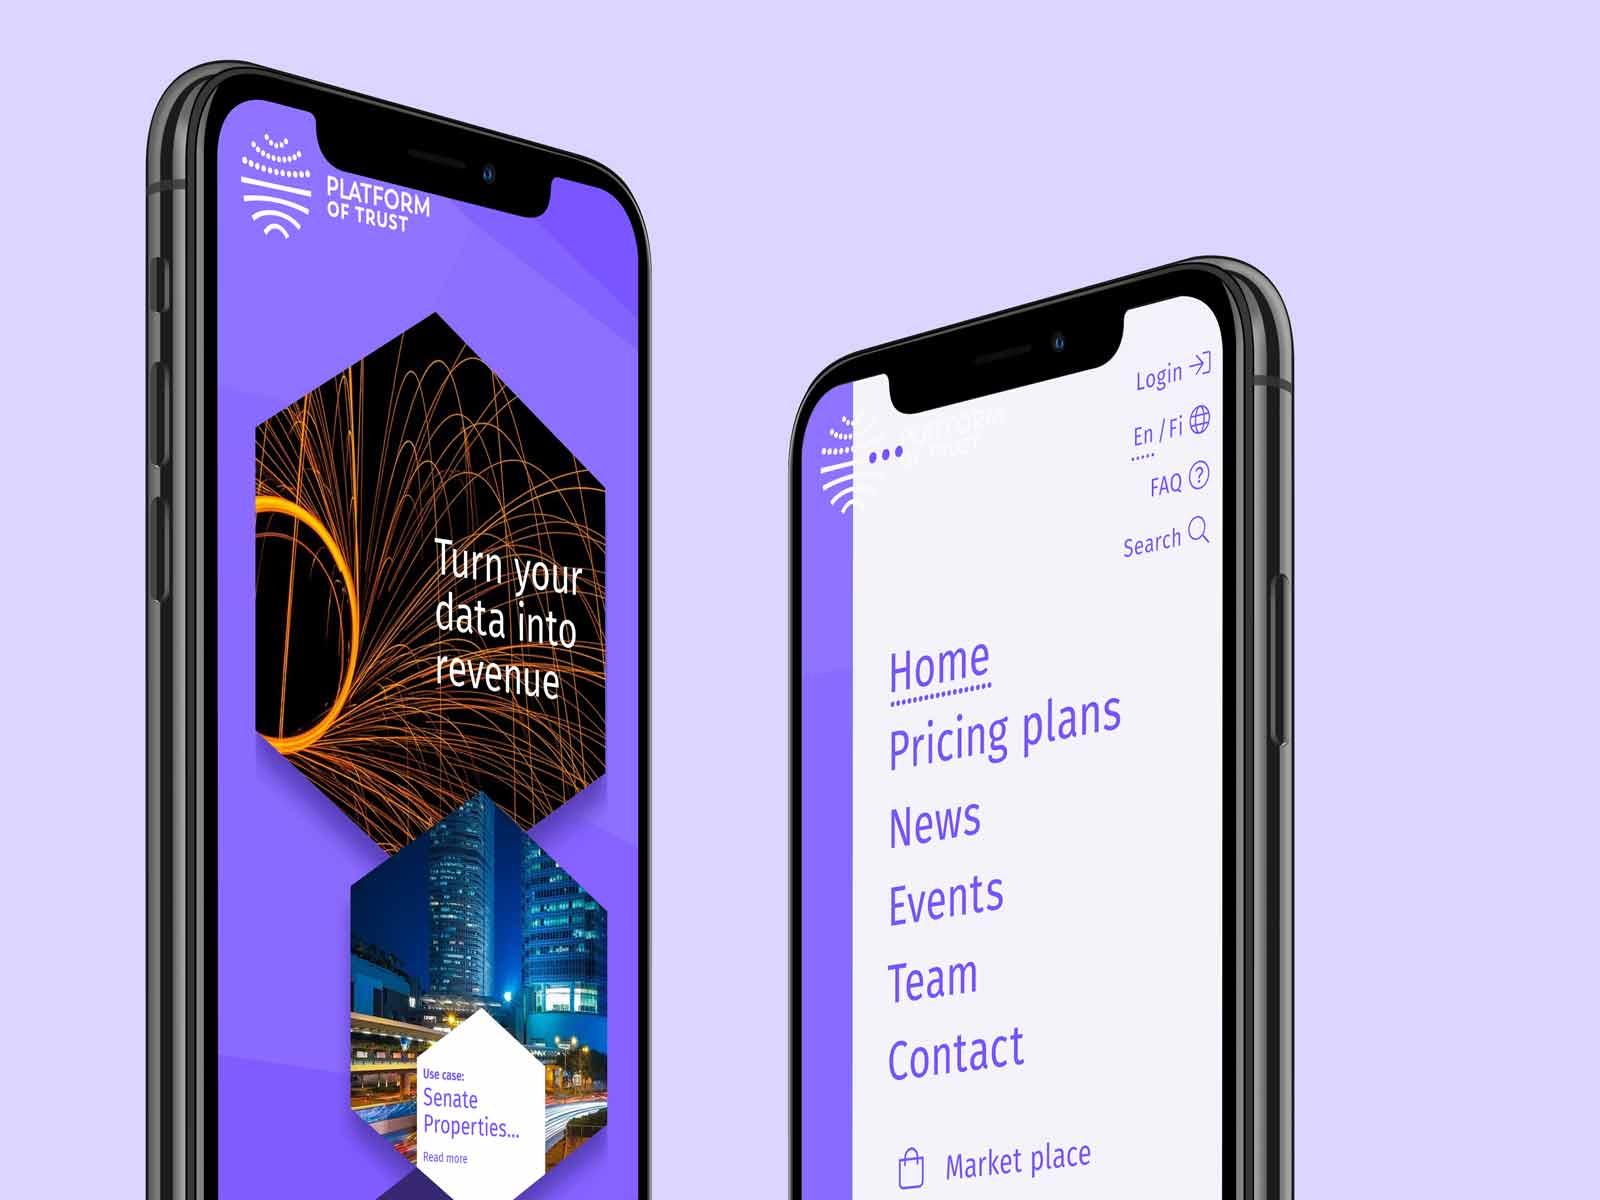 platformoftrust-mobile-2019-08-02